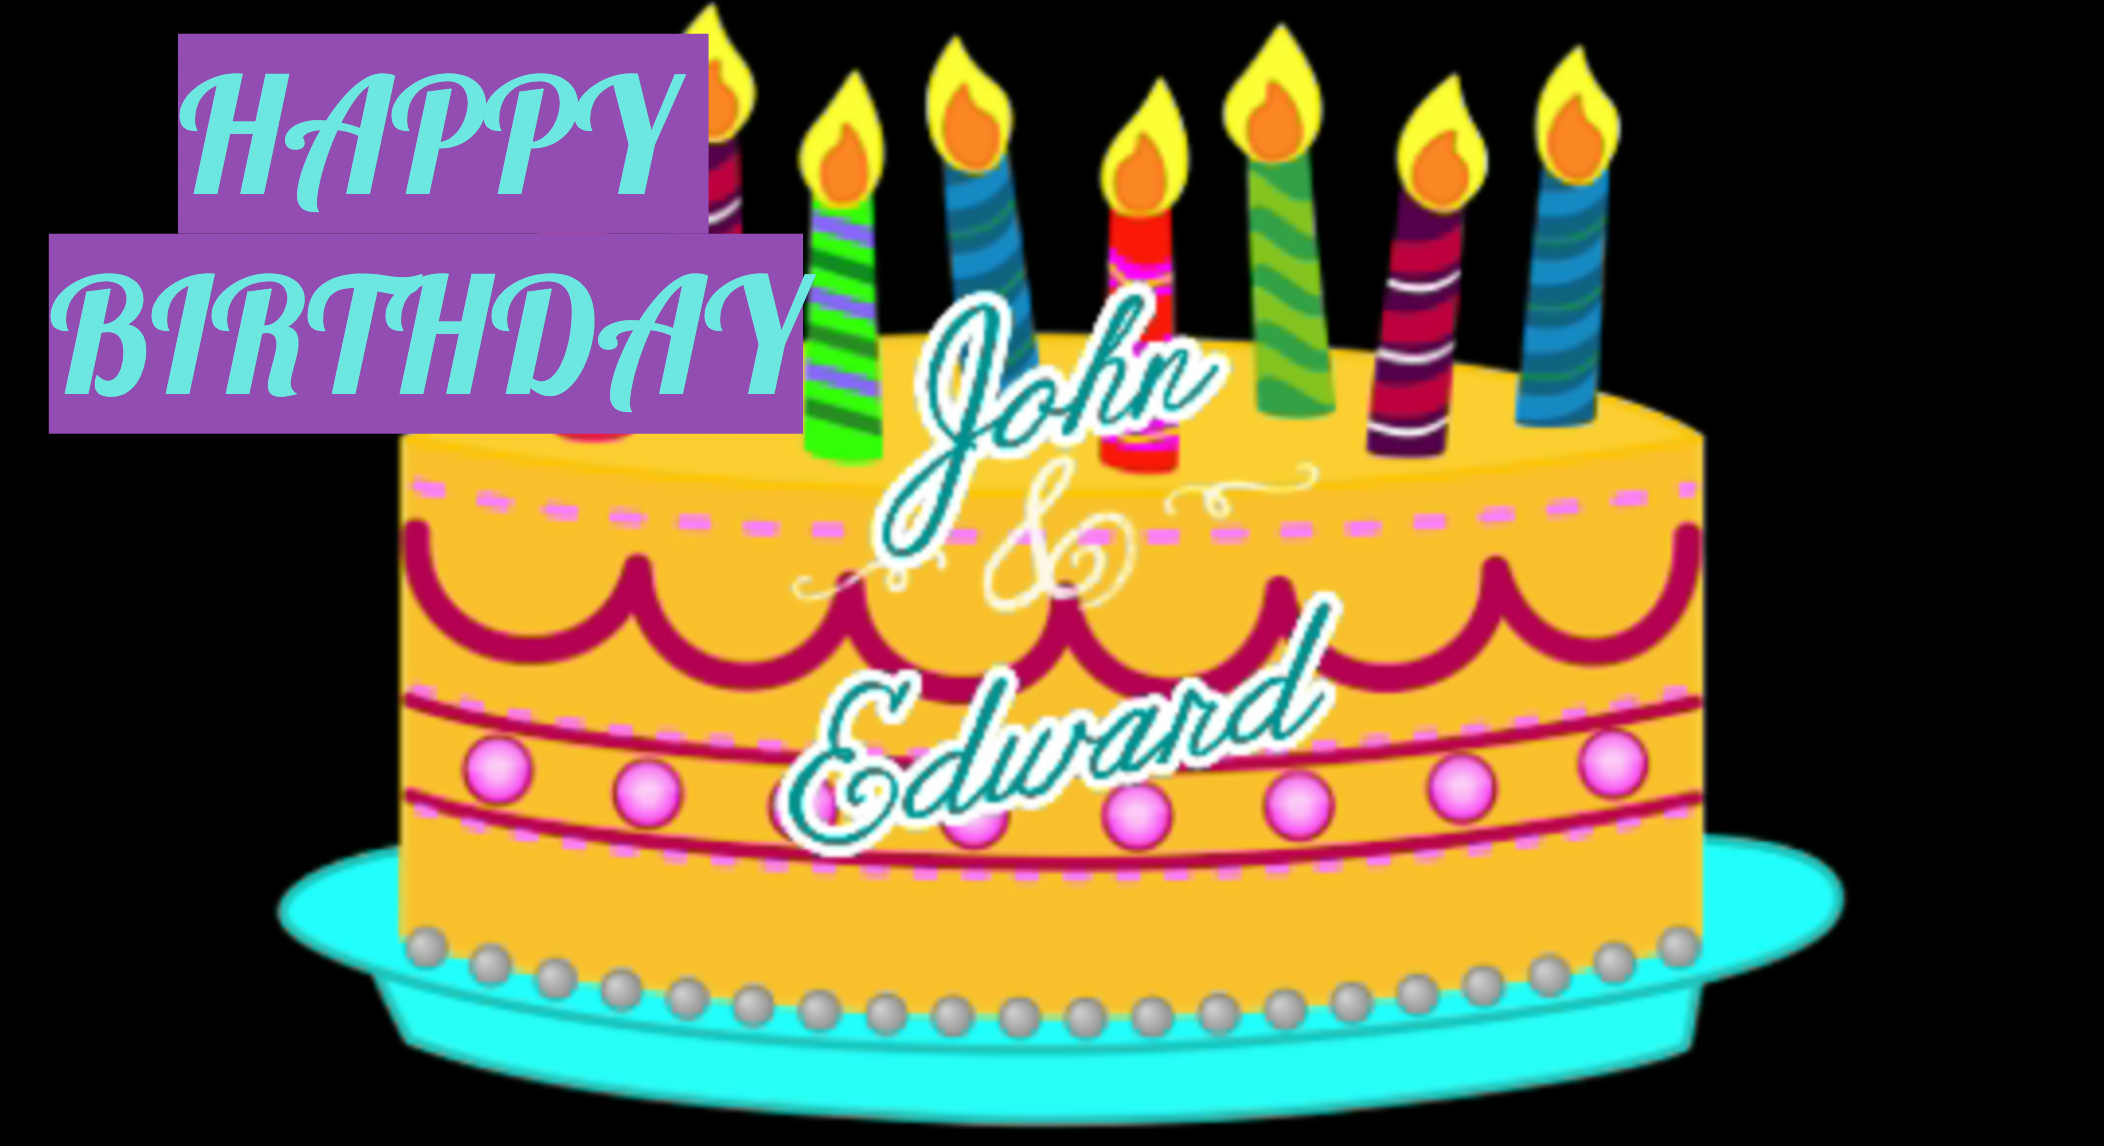 Astounding Happy Birthday John And Edward Jed World News Funny Birthday Cards Online Kookostrdamsfinfo